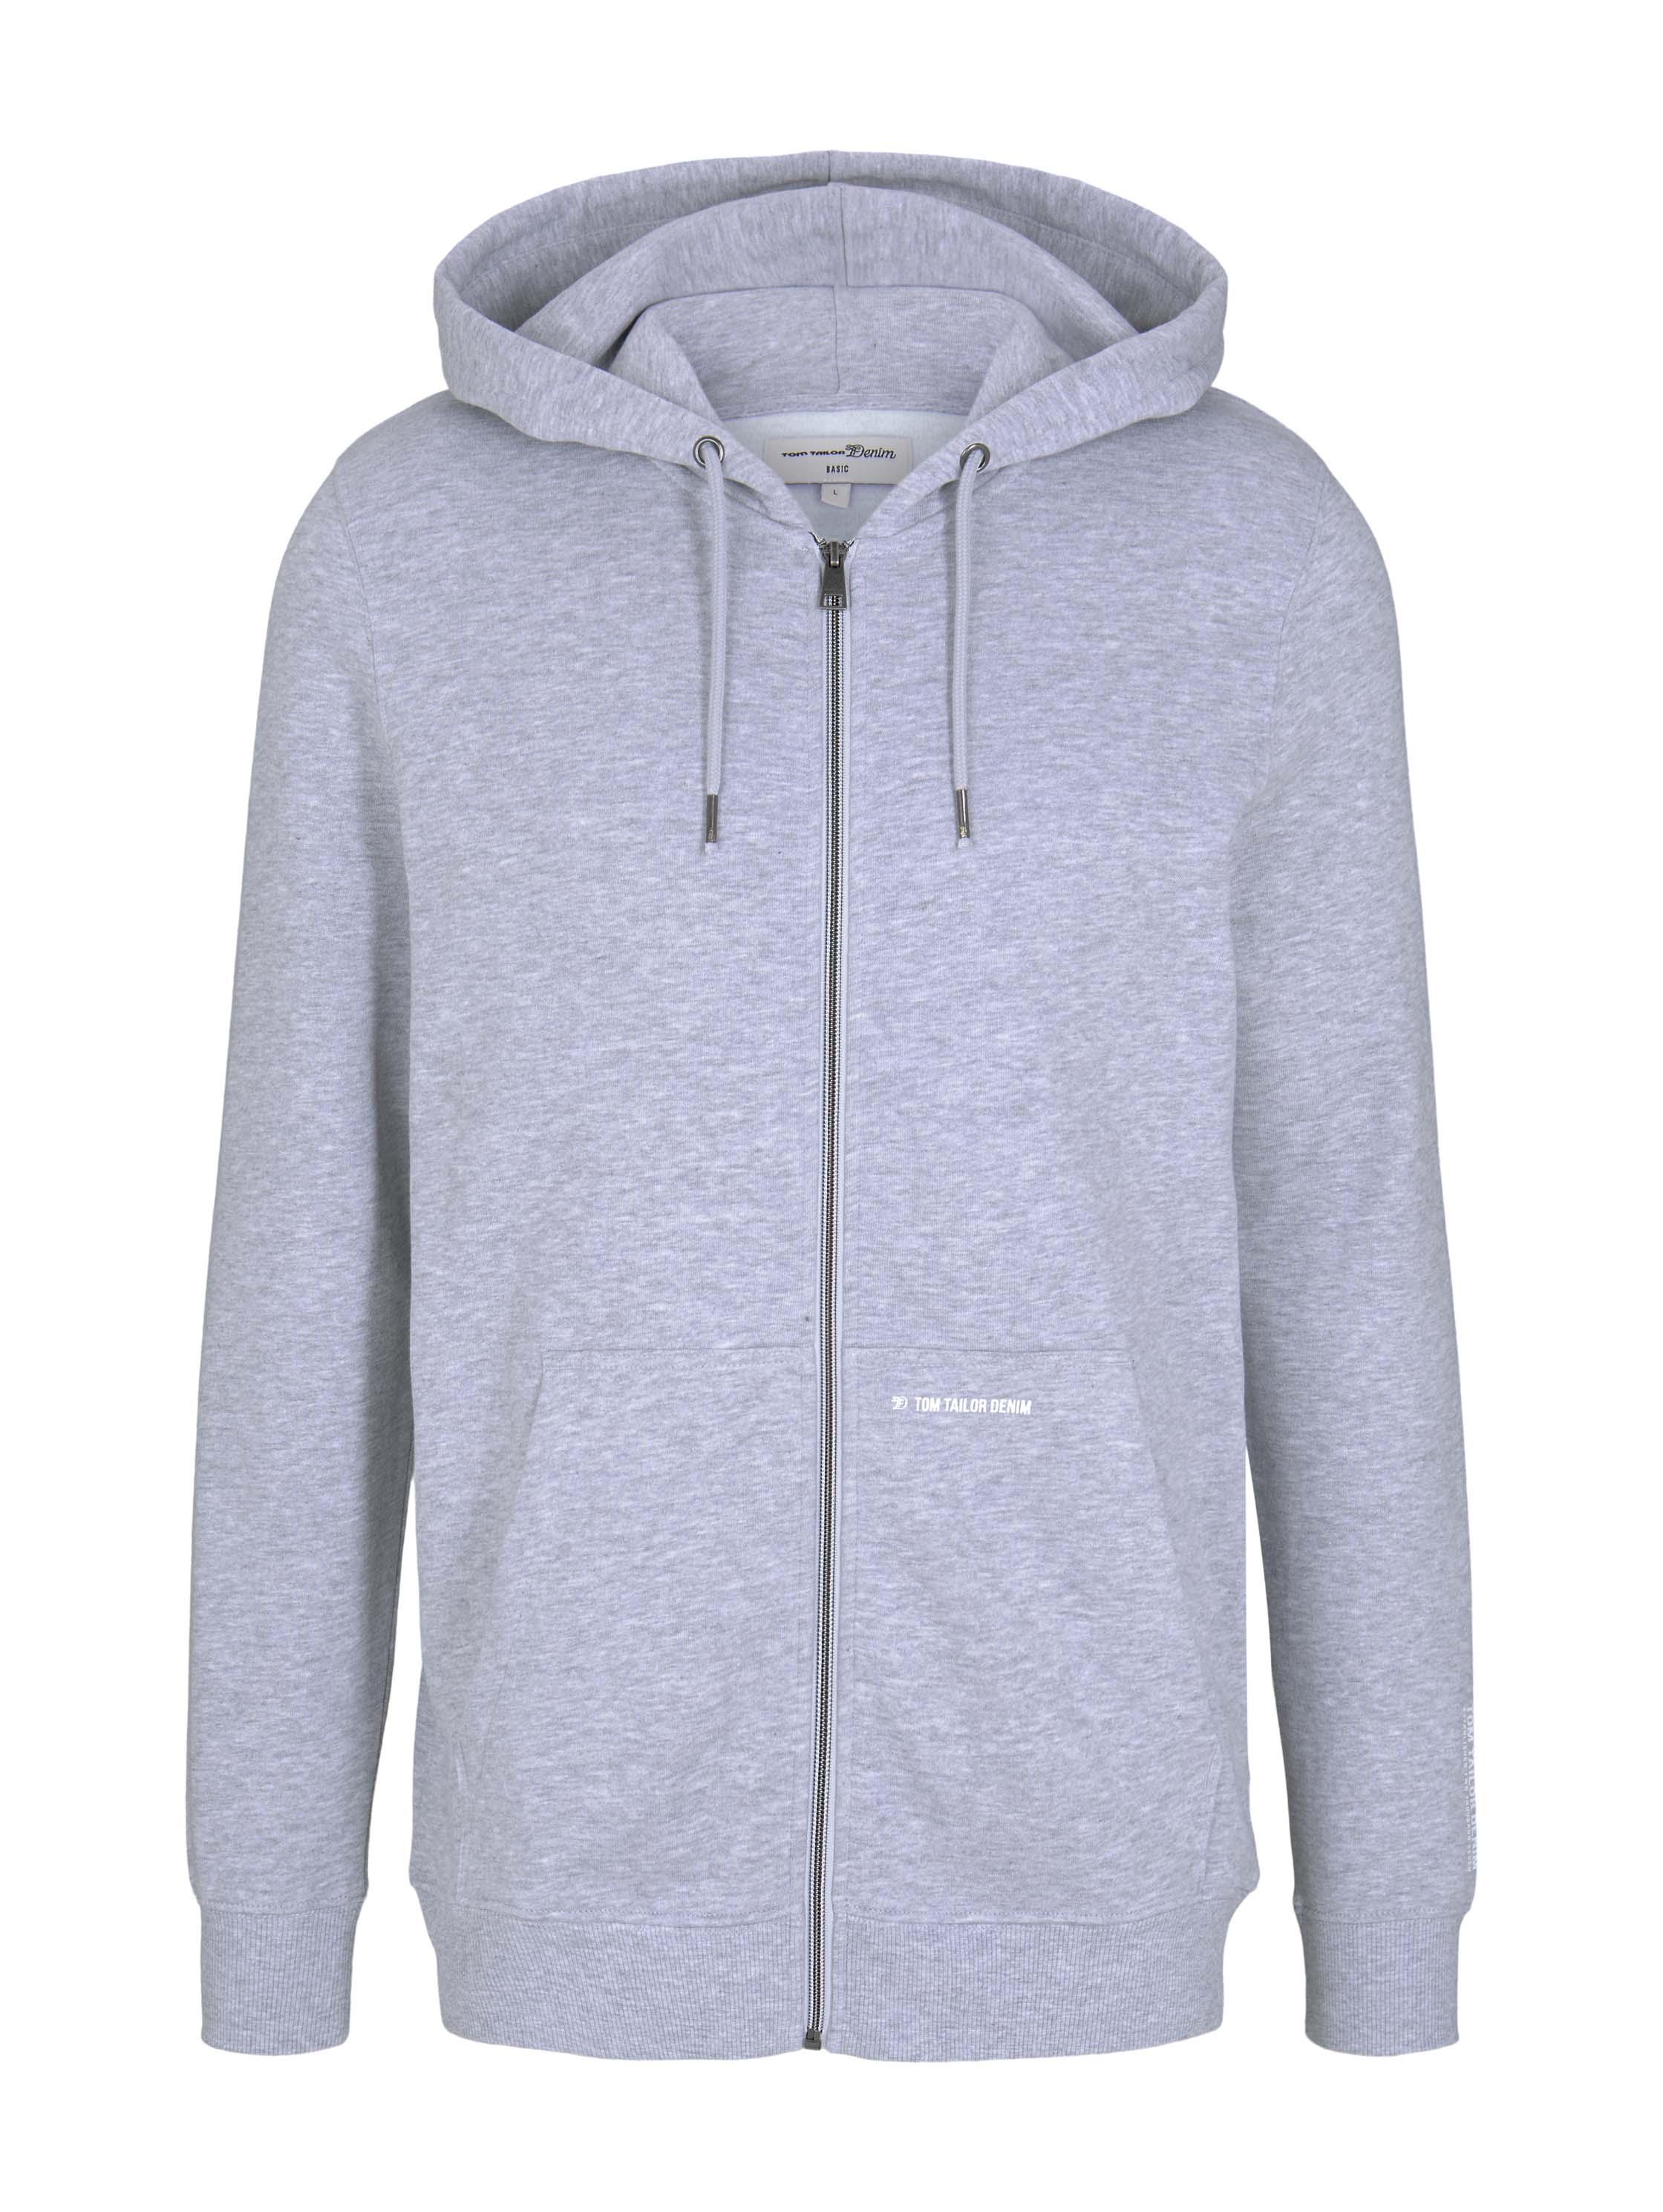 hoody jacket w. print, Light Stone Grey Melange